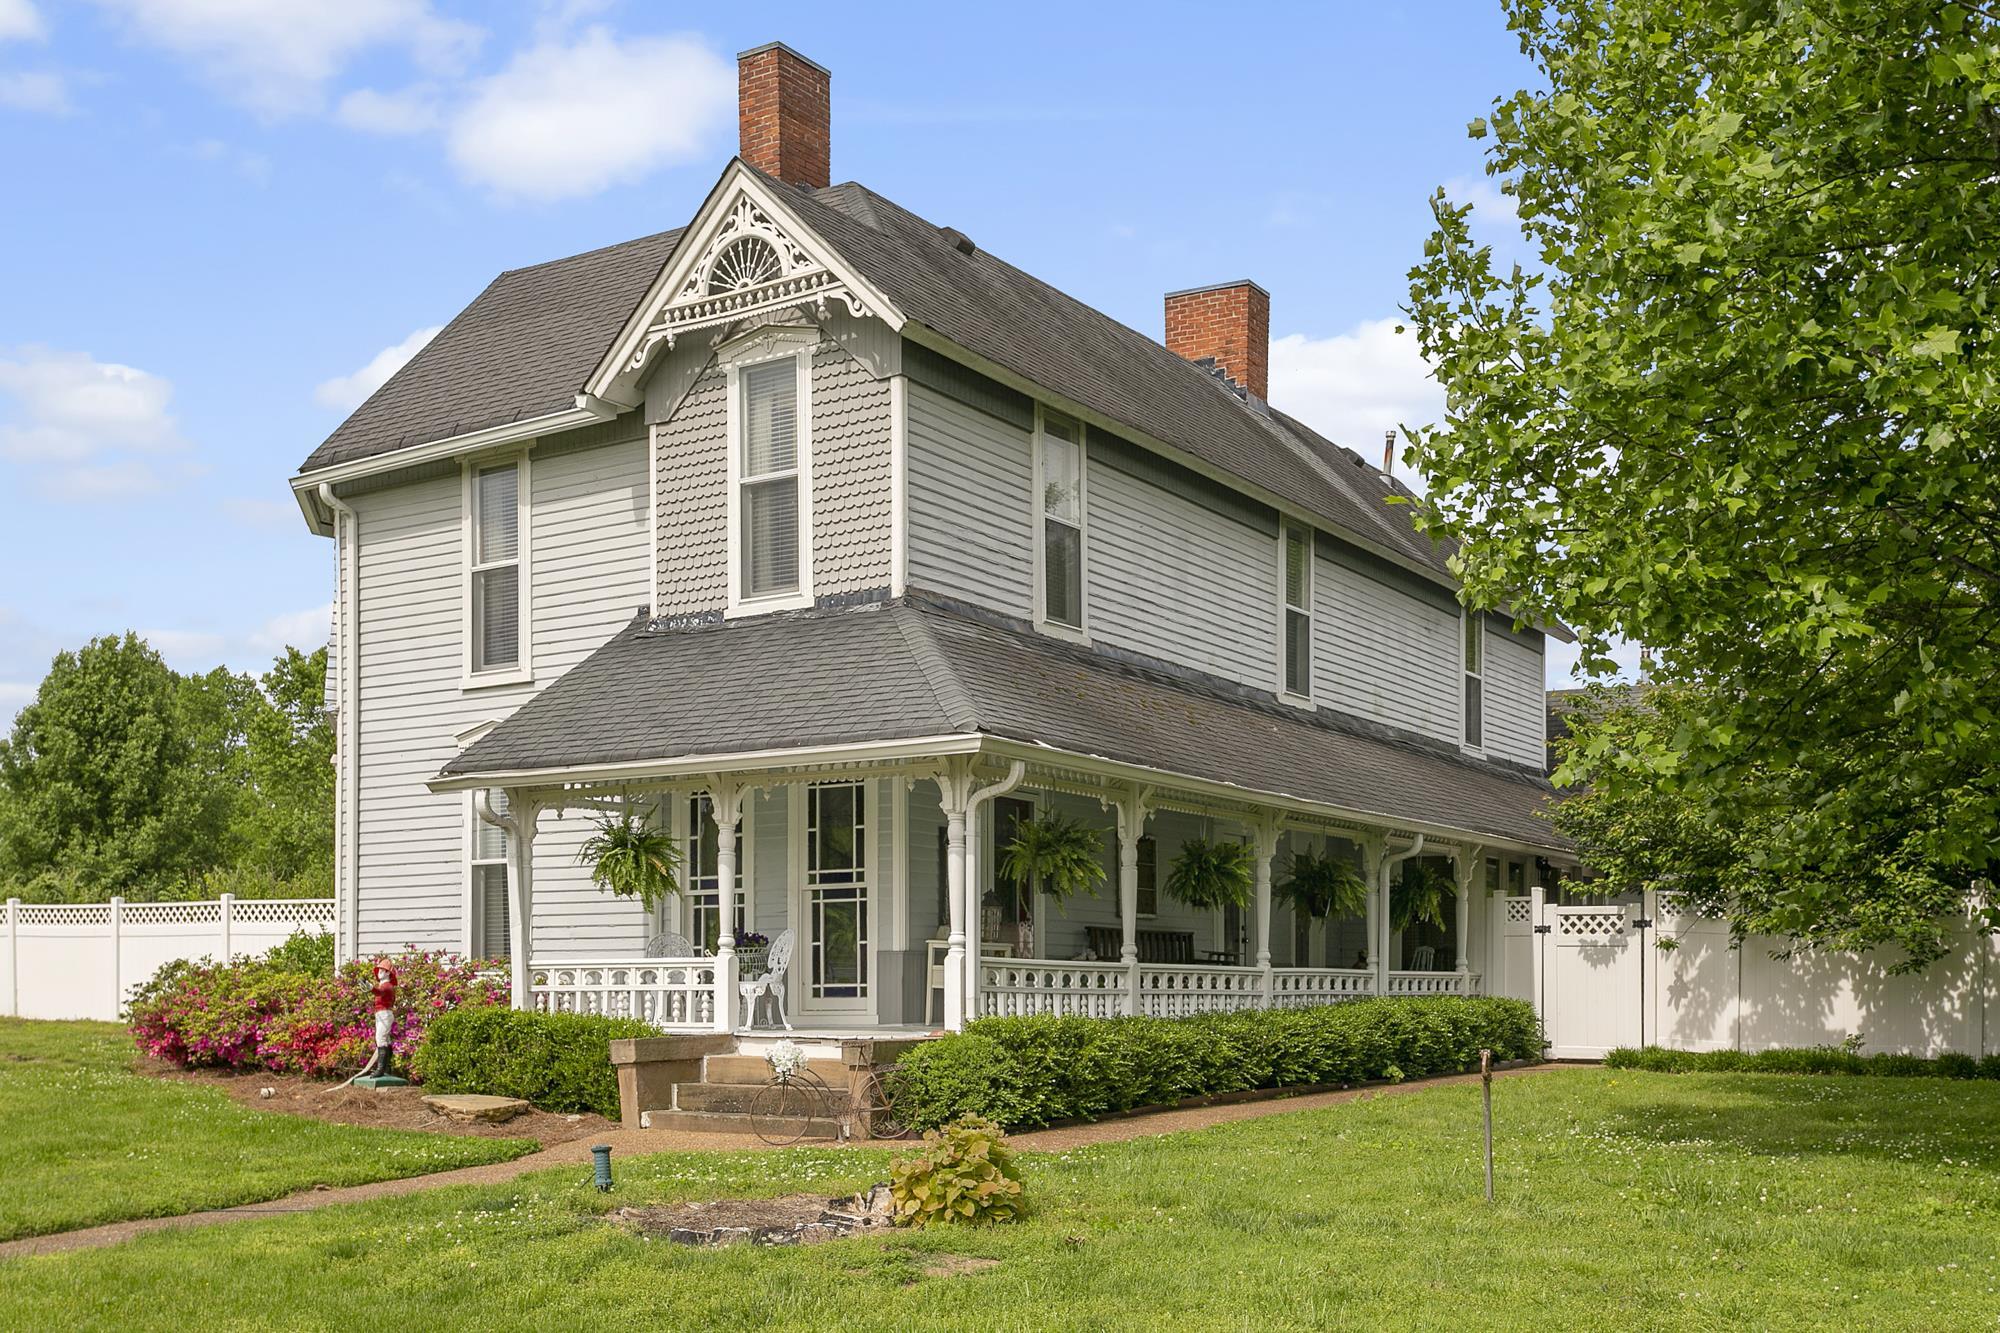 8819 Horton Hwy, College Grove, TN 37046 - College Grove, TN real estate listing